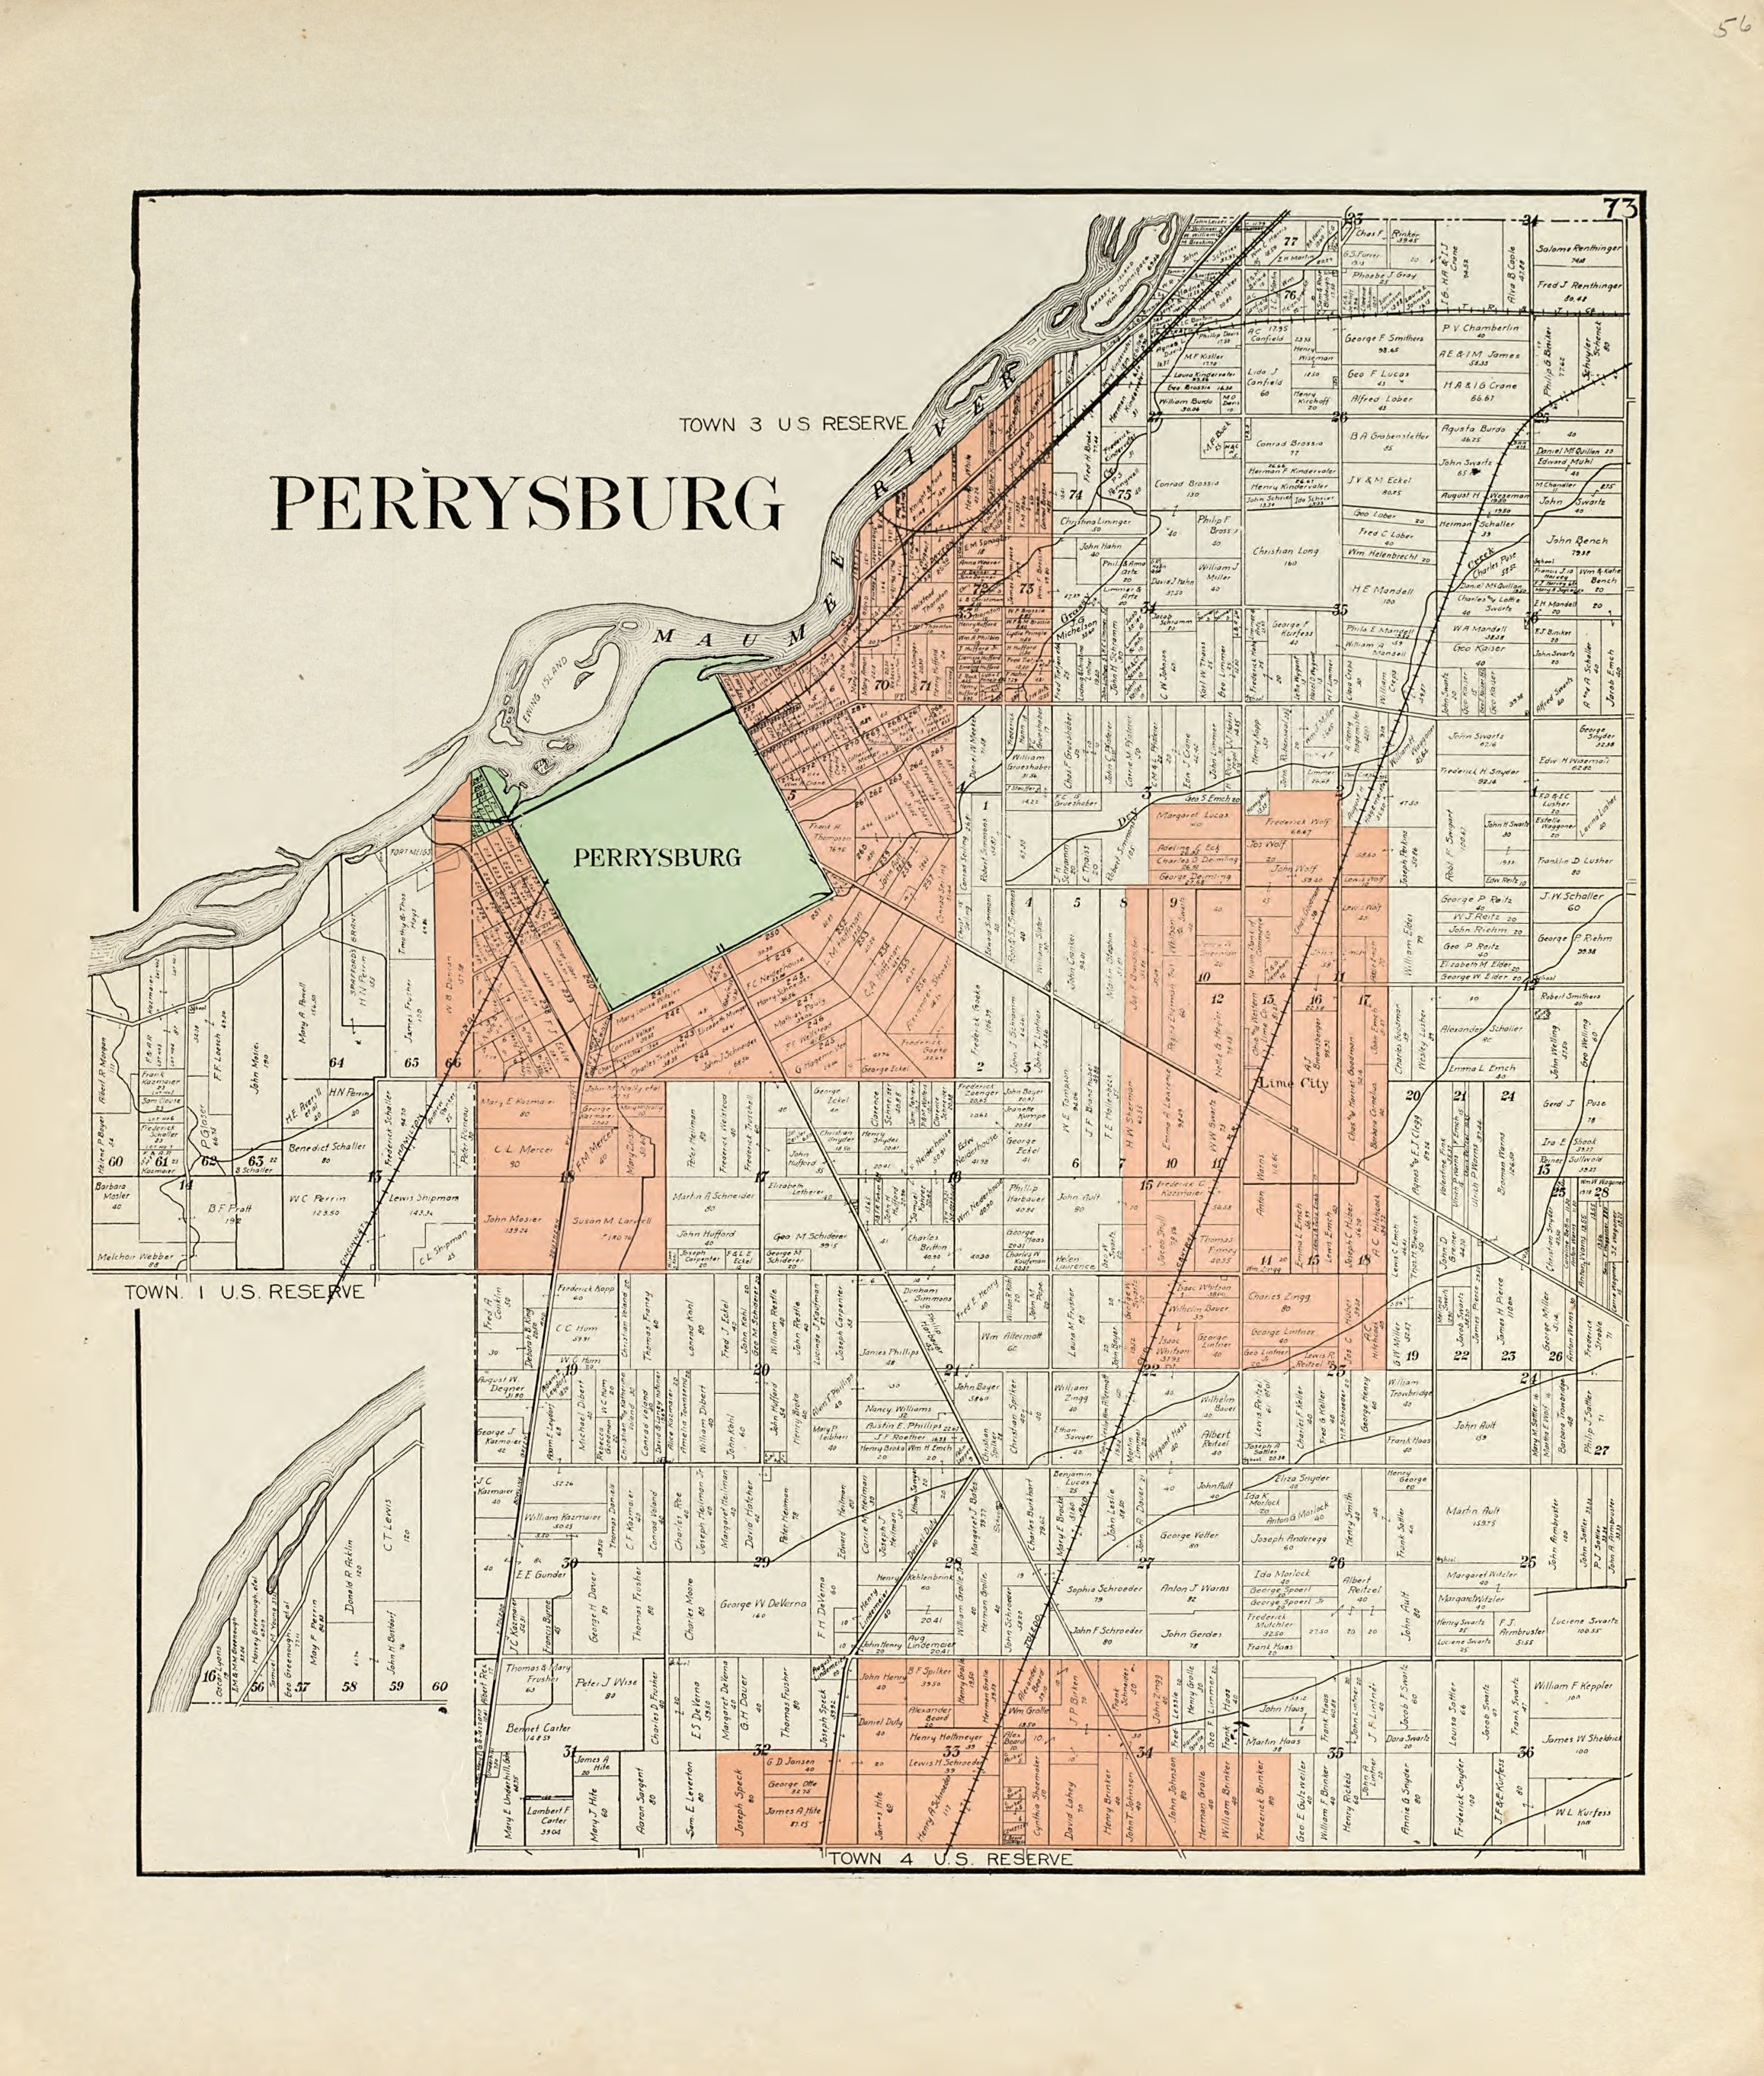 Perrysburg Ohio Map File:1912 Perrysburg Ohio map.   Wikimedia Commons